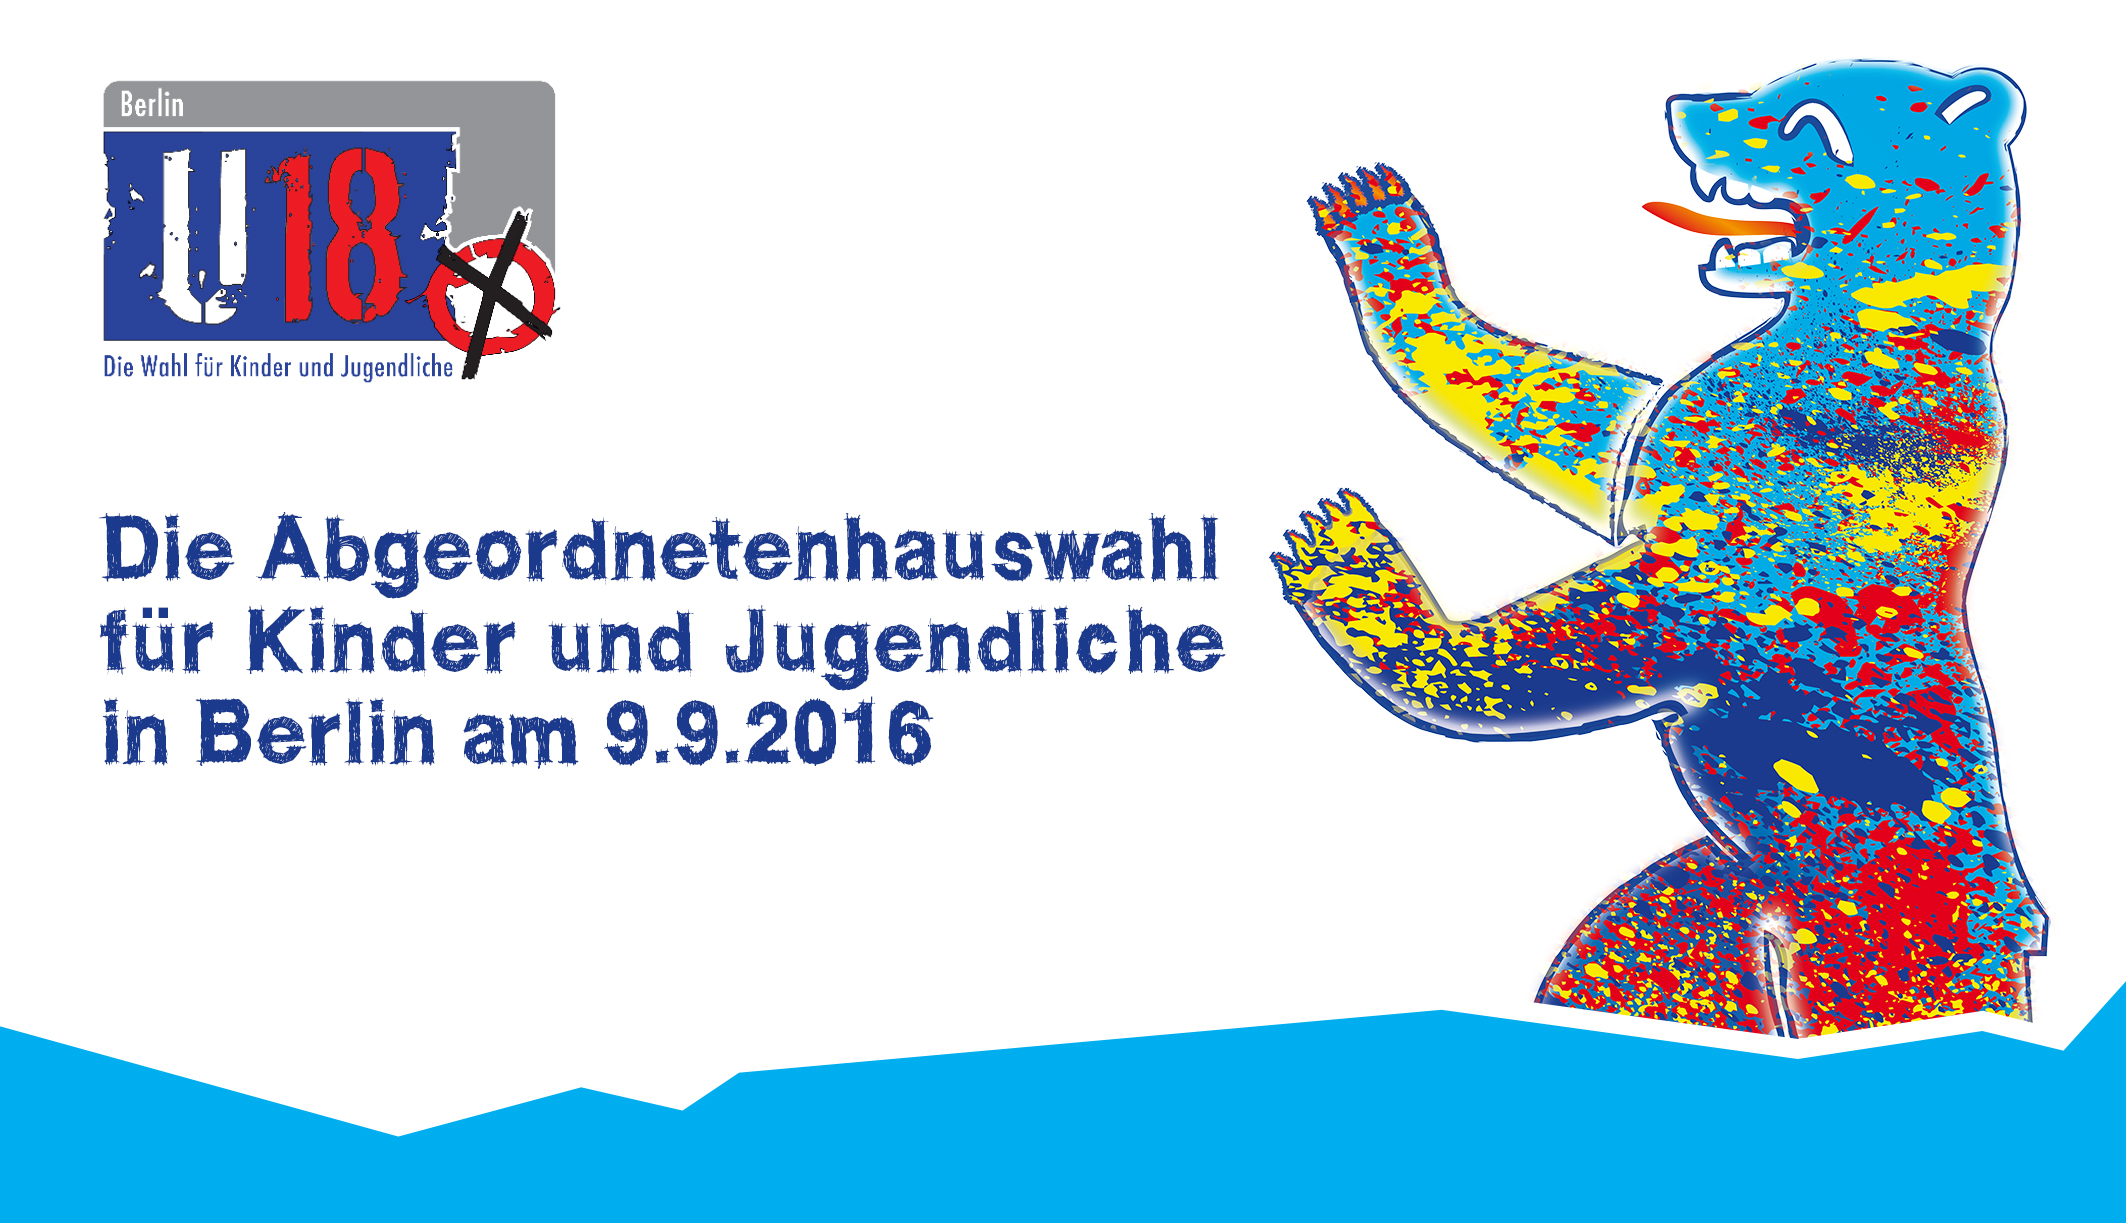 Quelle: AAA SPI Drehscheibe Kinder- und Jugendpolitik U18 Abgeordnetenhauswahl